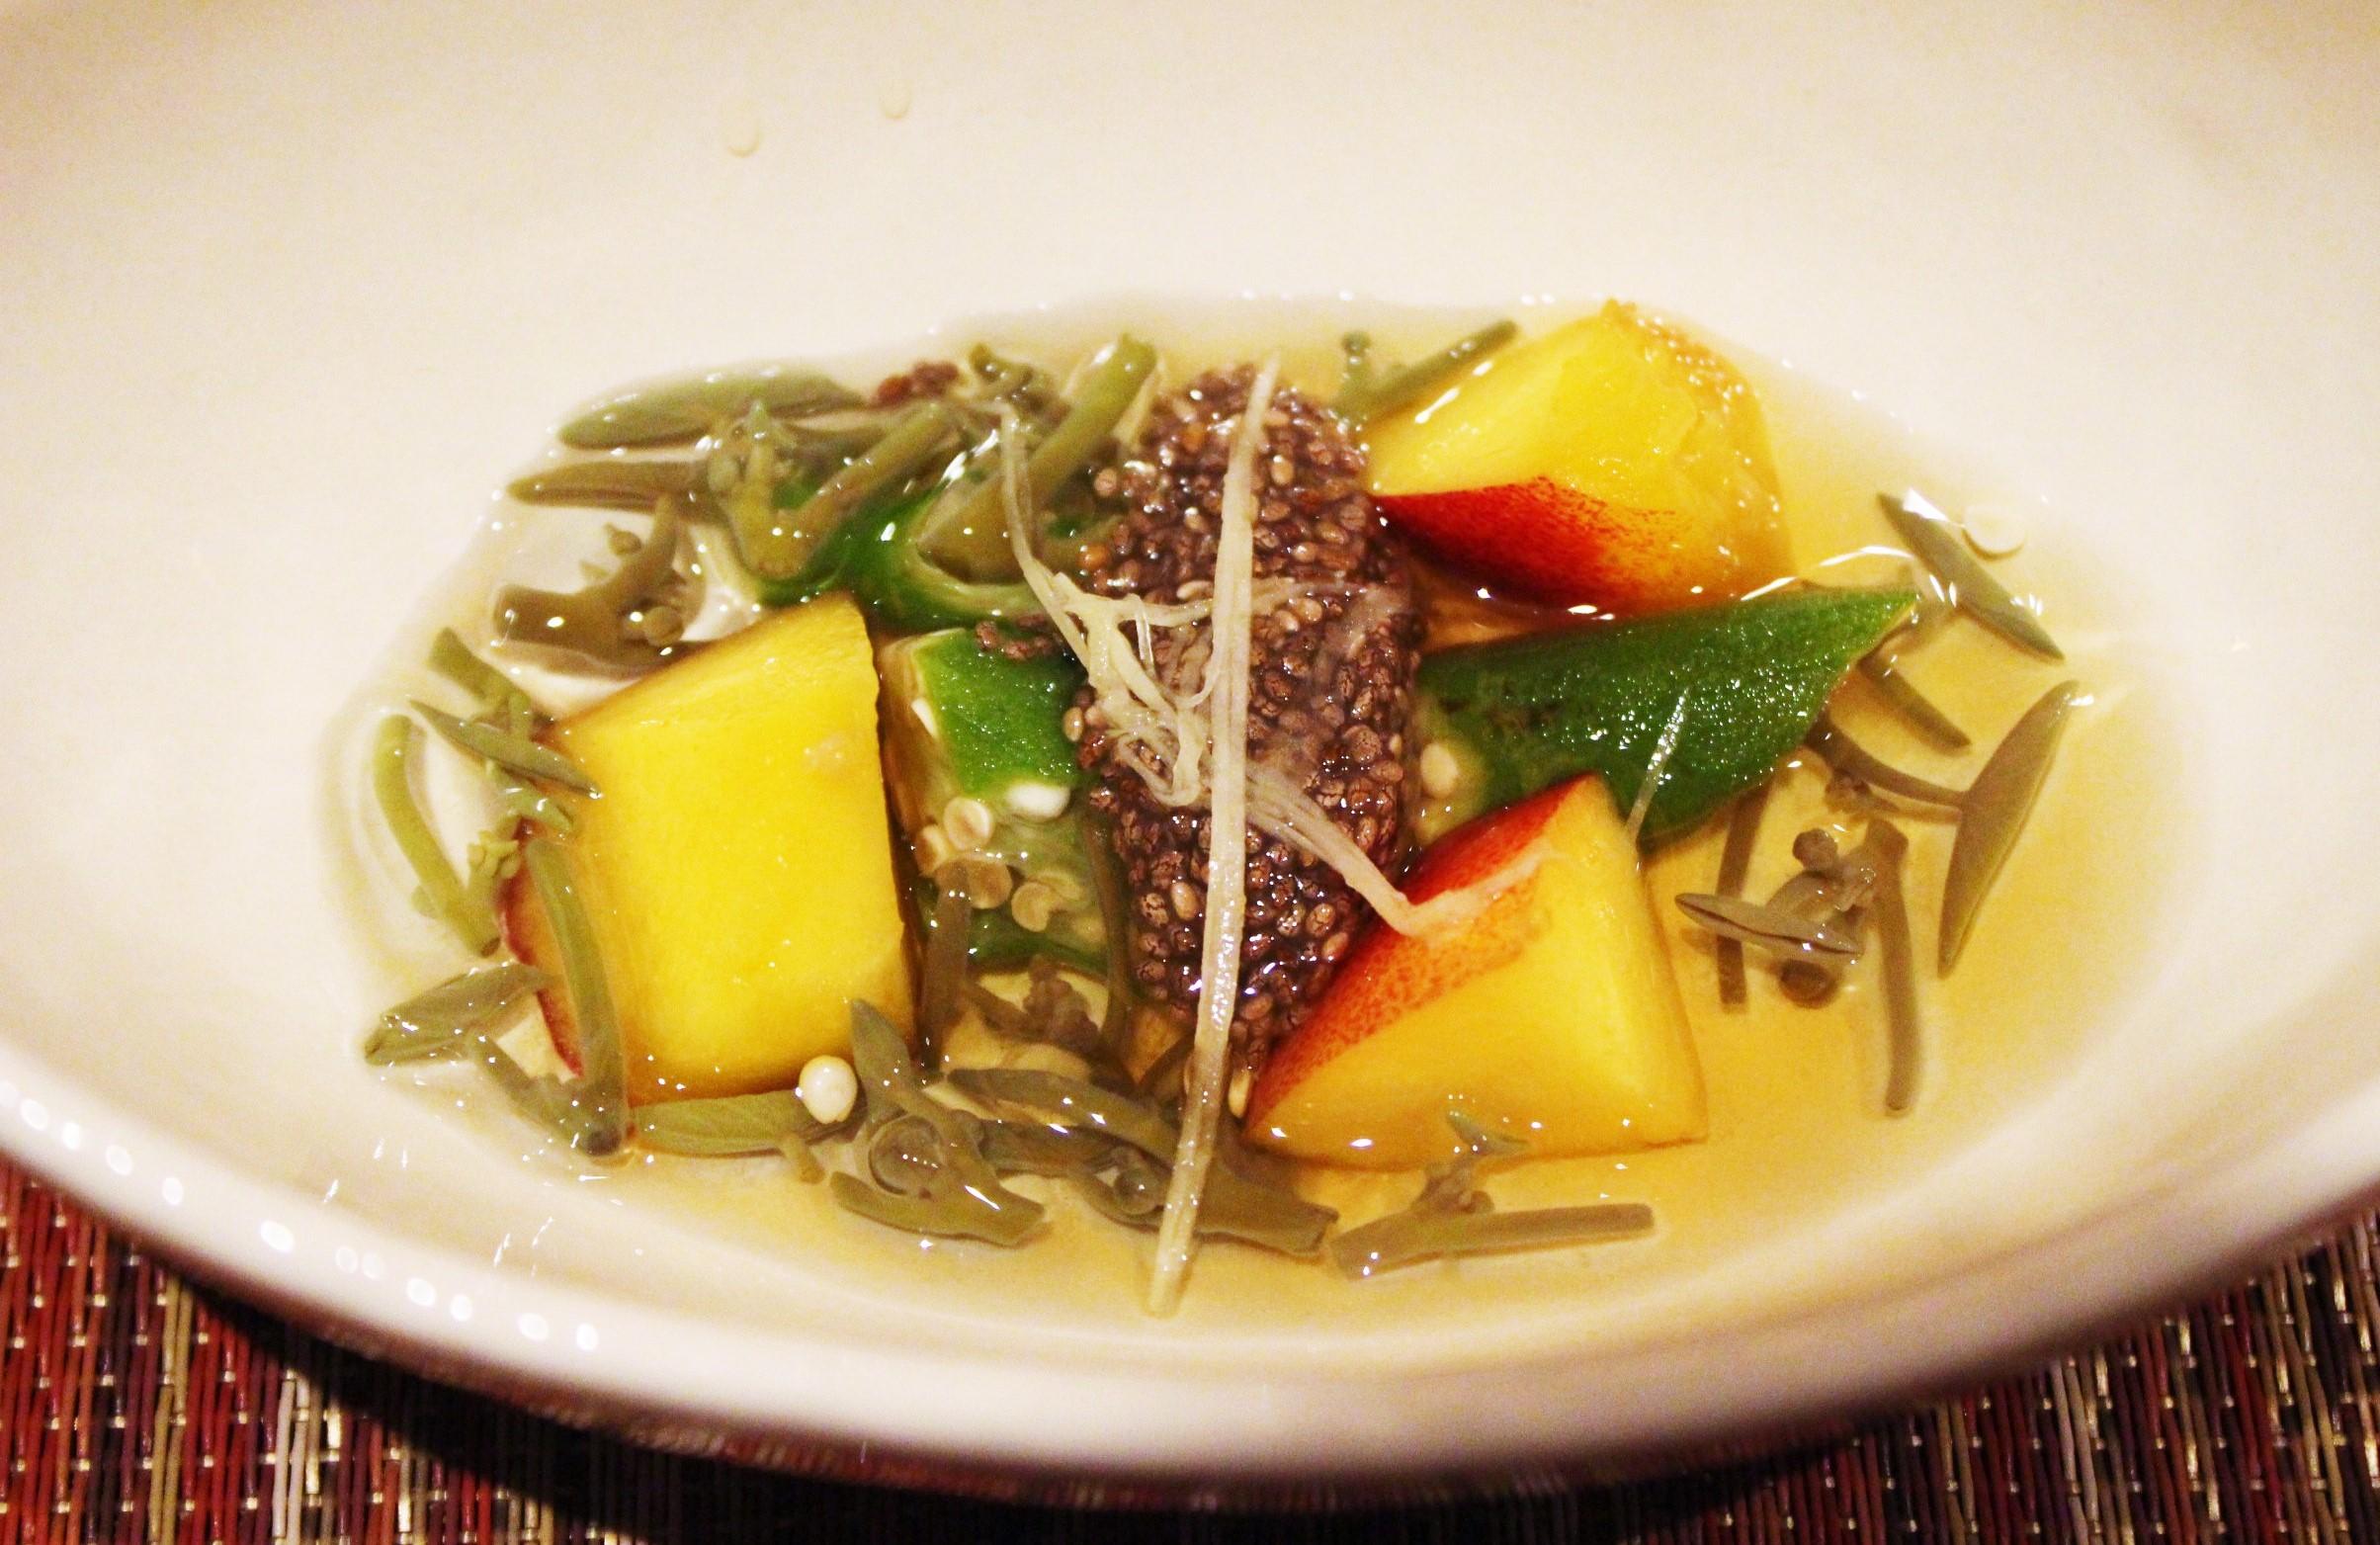 """Tomezakana"" Eighth Course: Junsai Fresh Water Shield, Okura, and Nectarine with Chia Seed Vinegar"